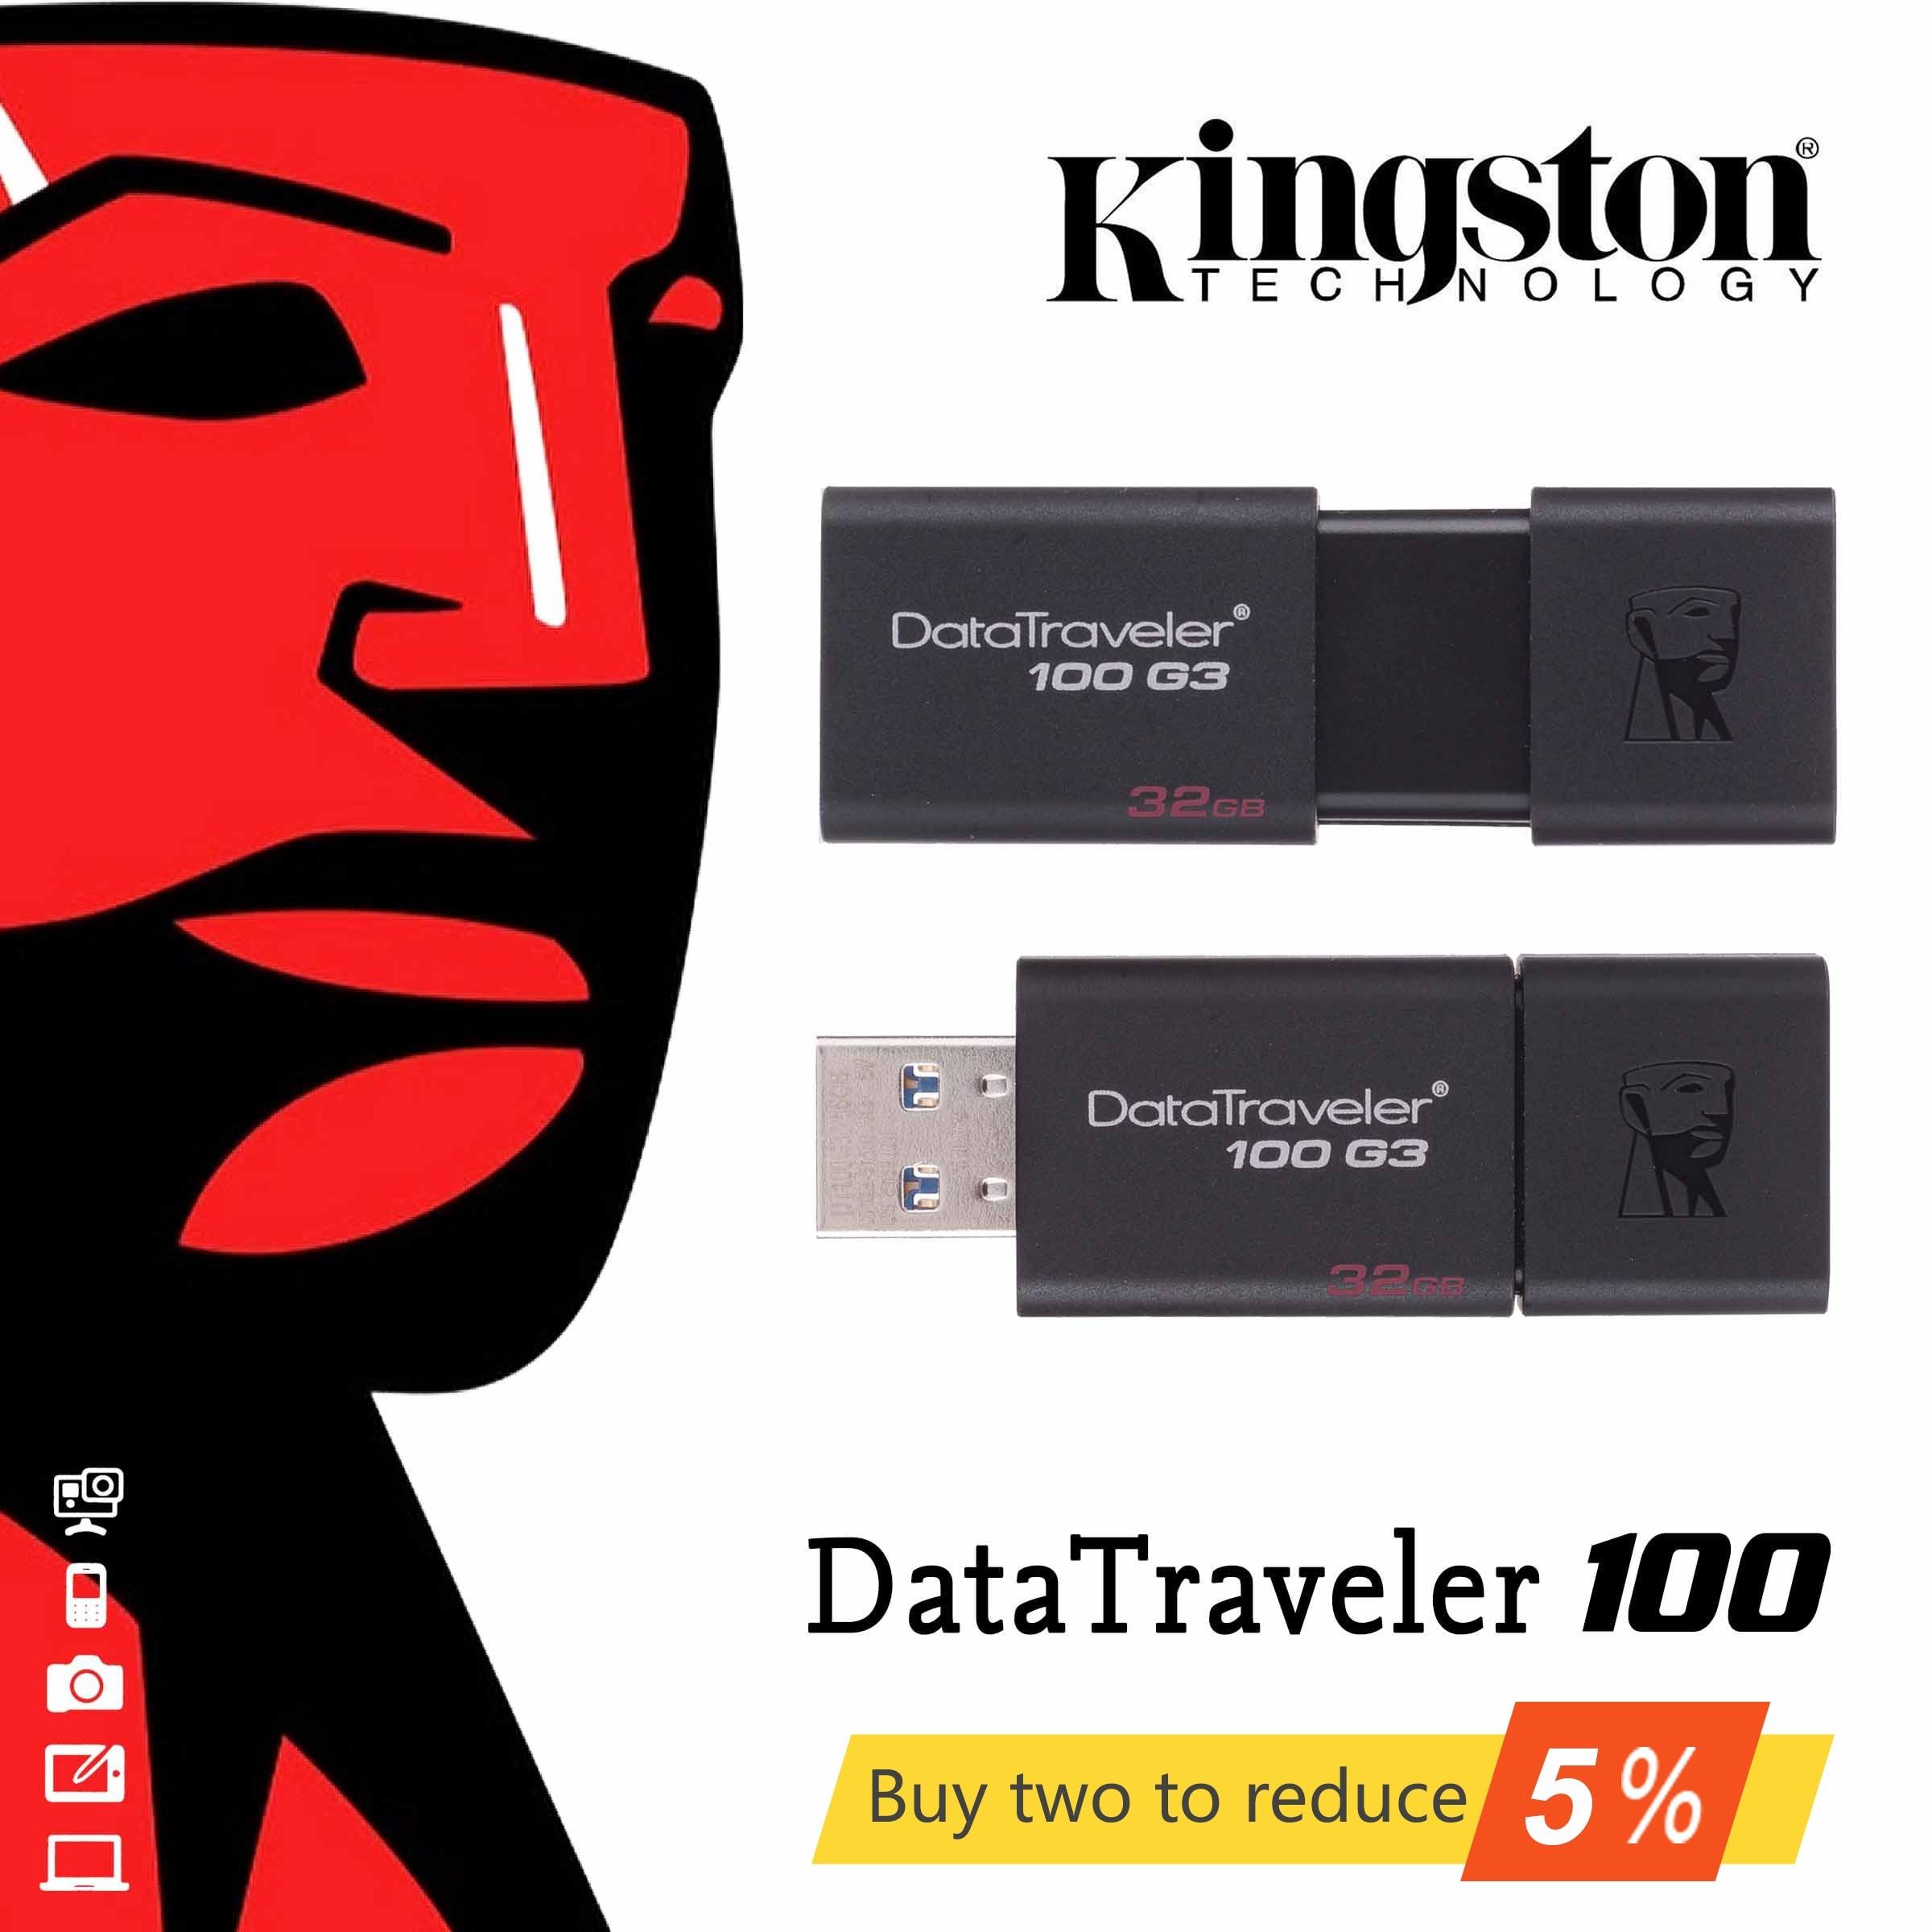 Original Kingston DataTraveler USB 3.0 de Alta Velocidade USB Flash Drive GB 32 16 GB GB 16 64 32 64 GB de Memória pendrive Pen Drive Vara DT100G3